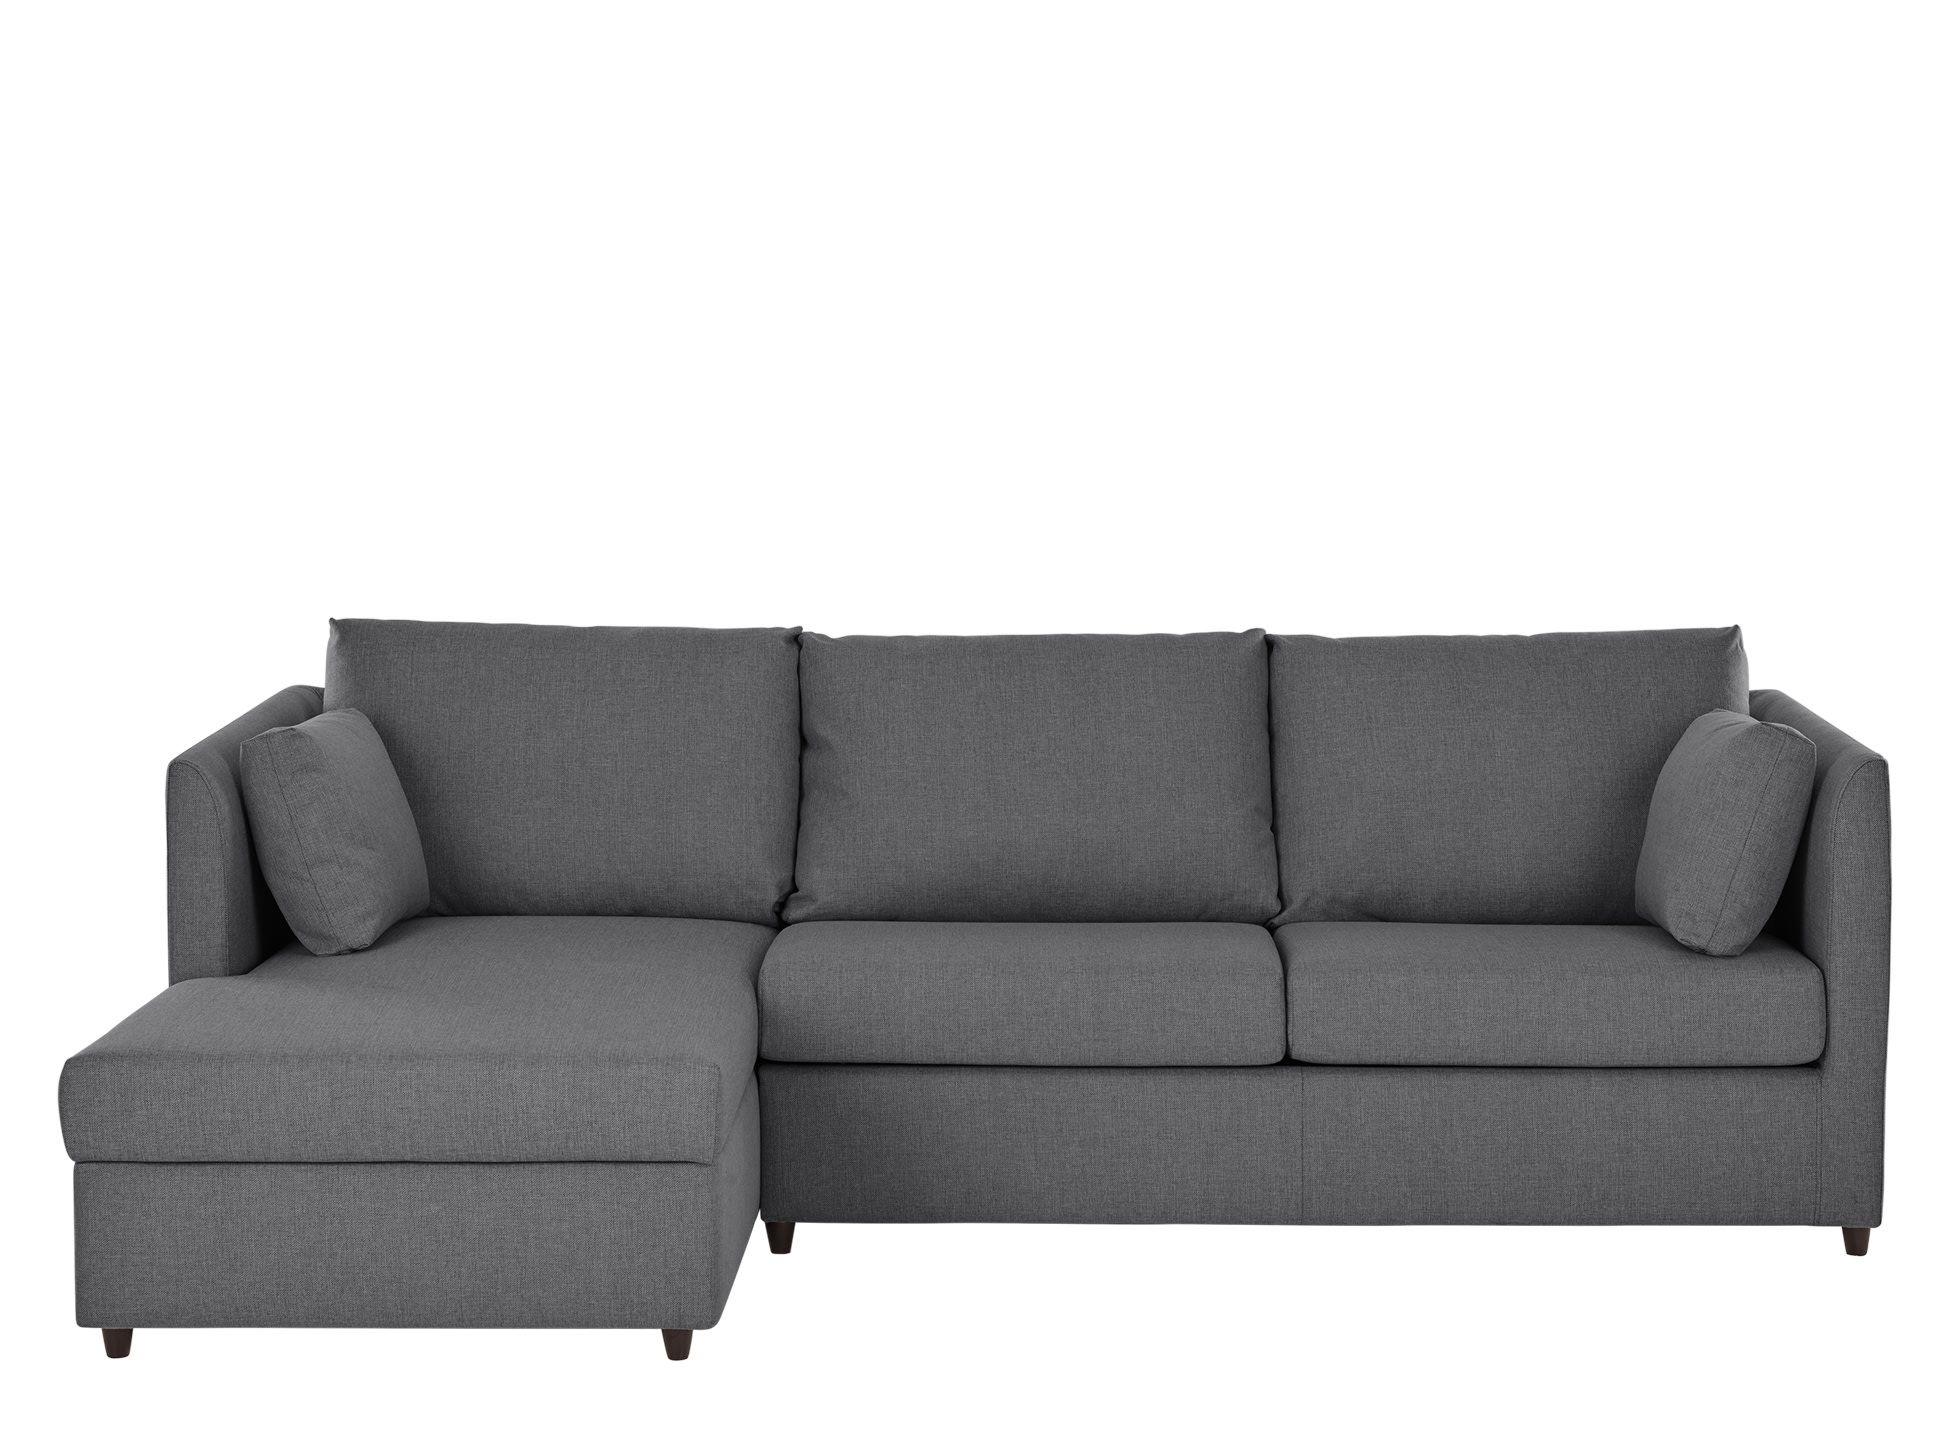 Made Night Grey Corner Sofa Bed Sofa Bed Corner Storage Foam